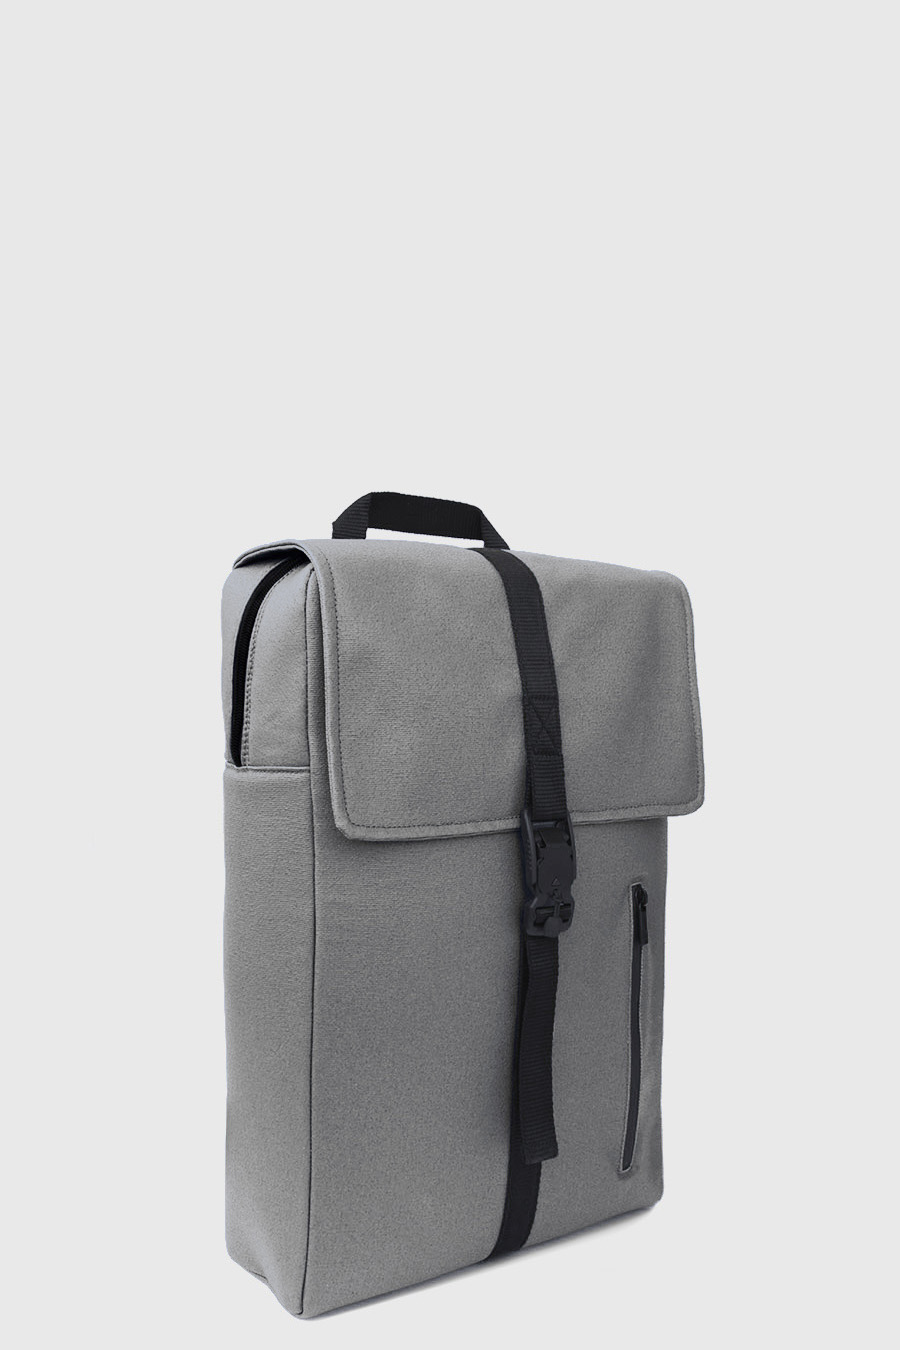 Mochila impermeable estilo urbano color gris claro hecho en España